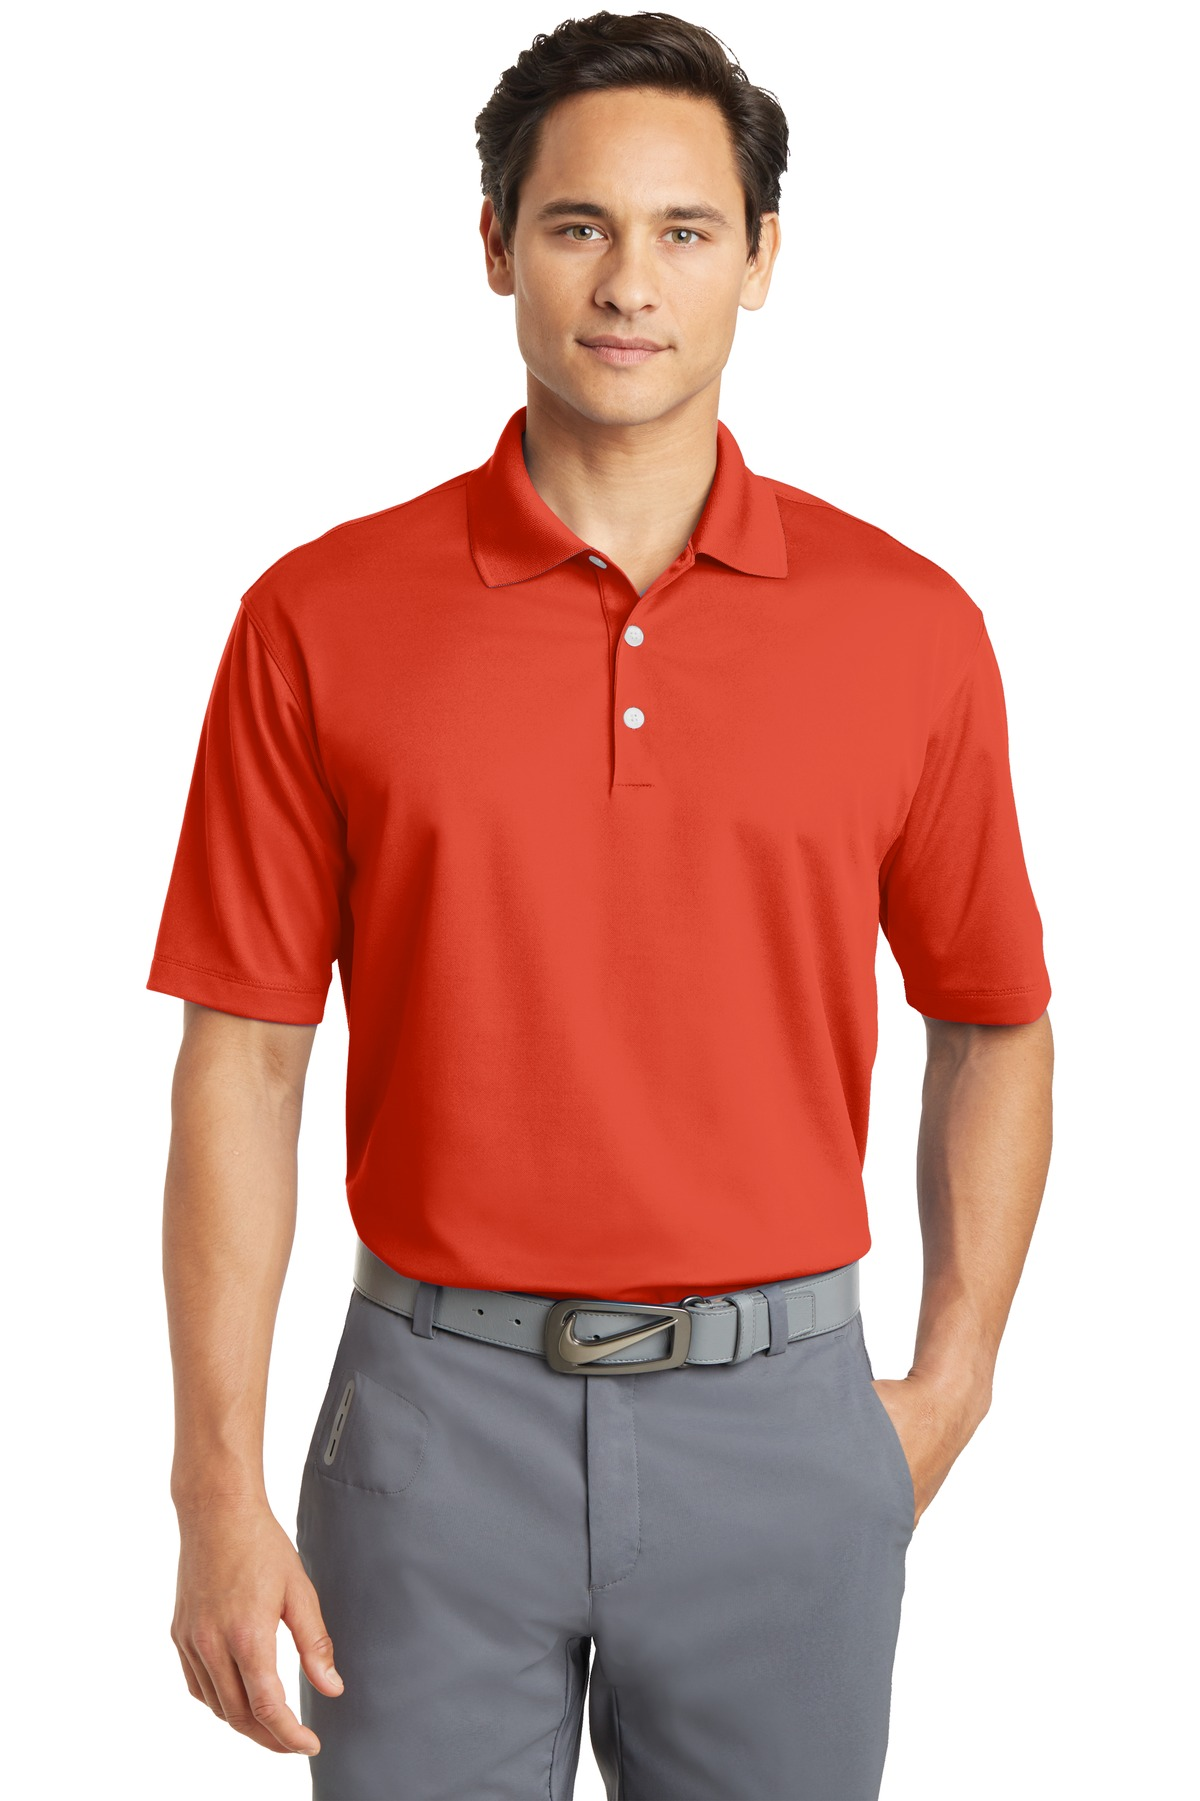 Nike Varsity Red